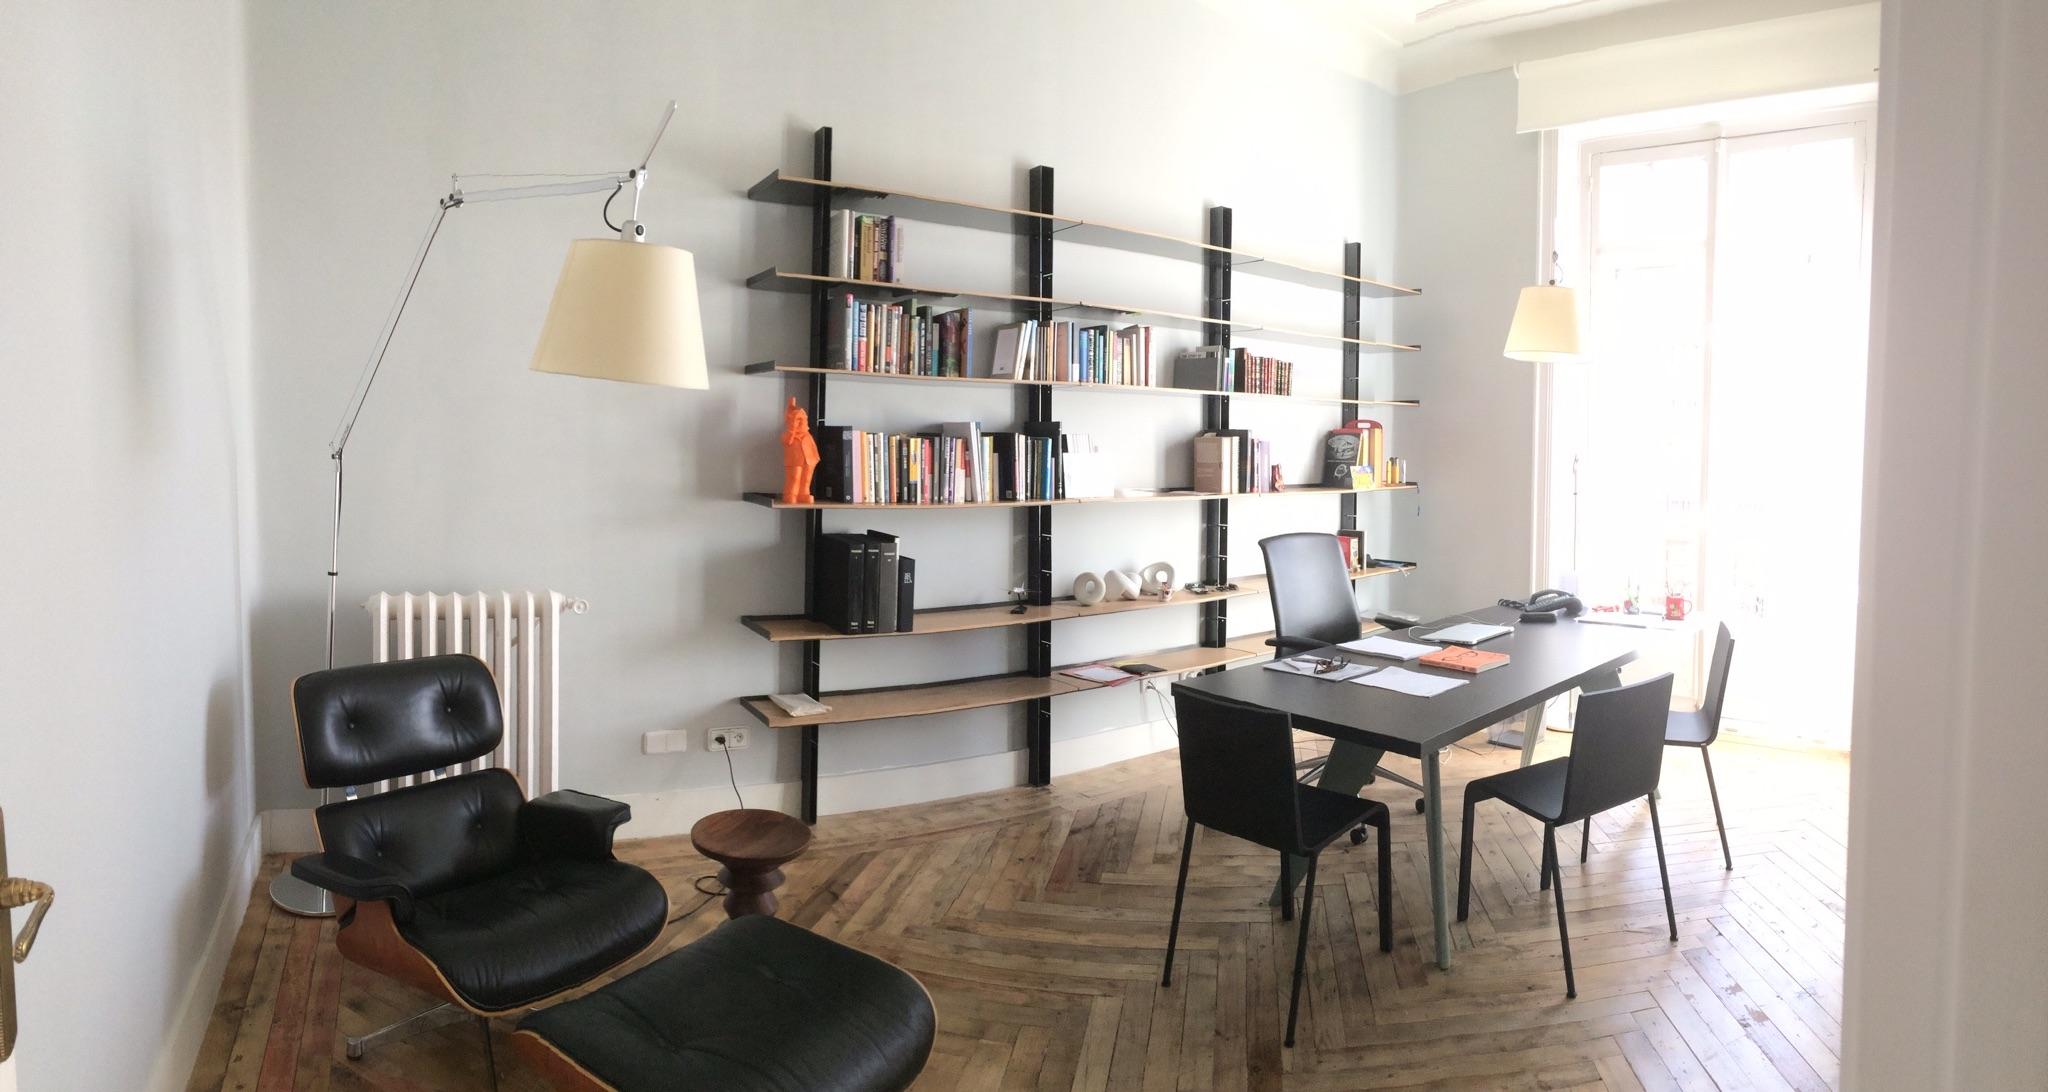 Furniture design -